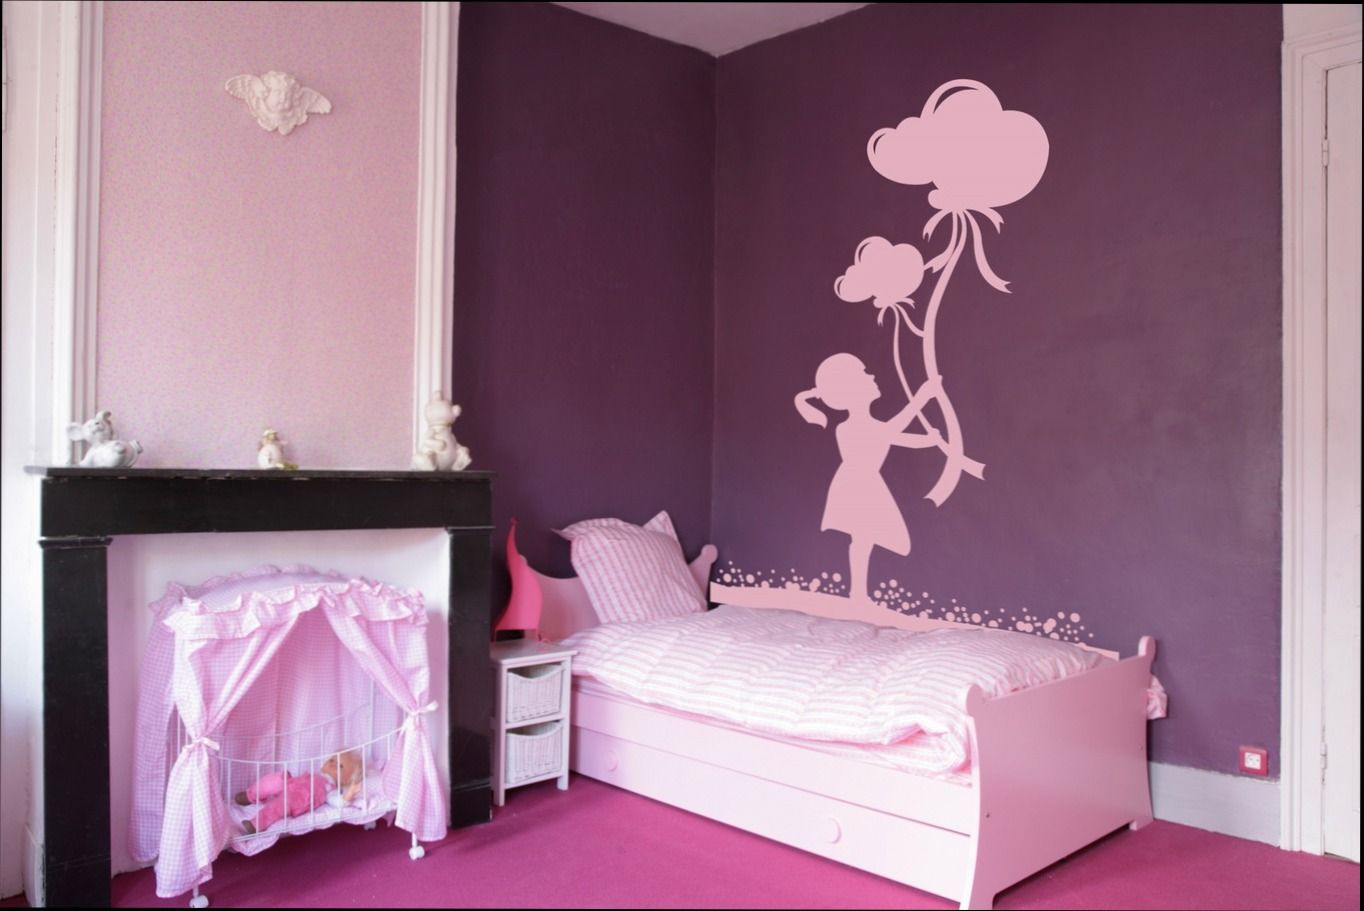 Charmant Chambre Filles 10 Ans | Chambre Fille : Chambre Fille 10 Ans Ikea